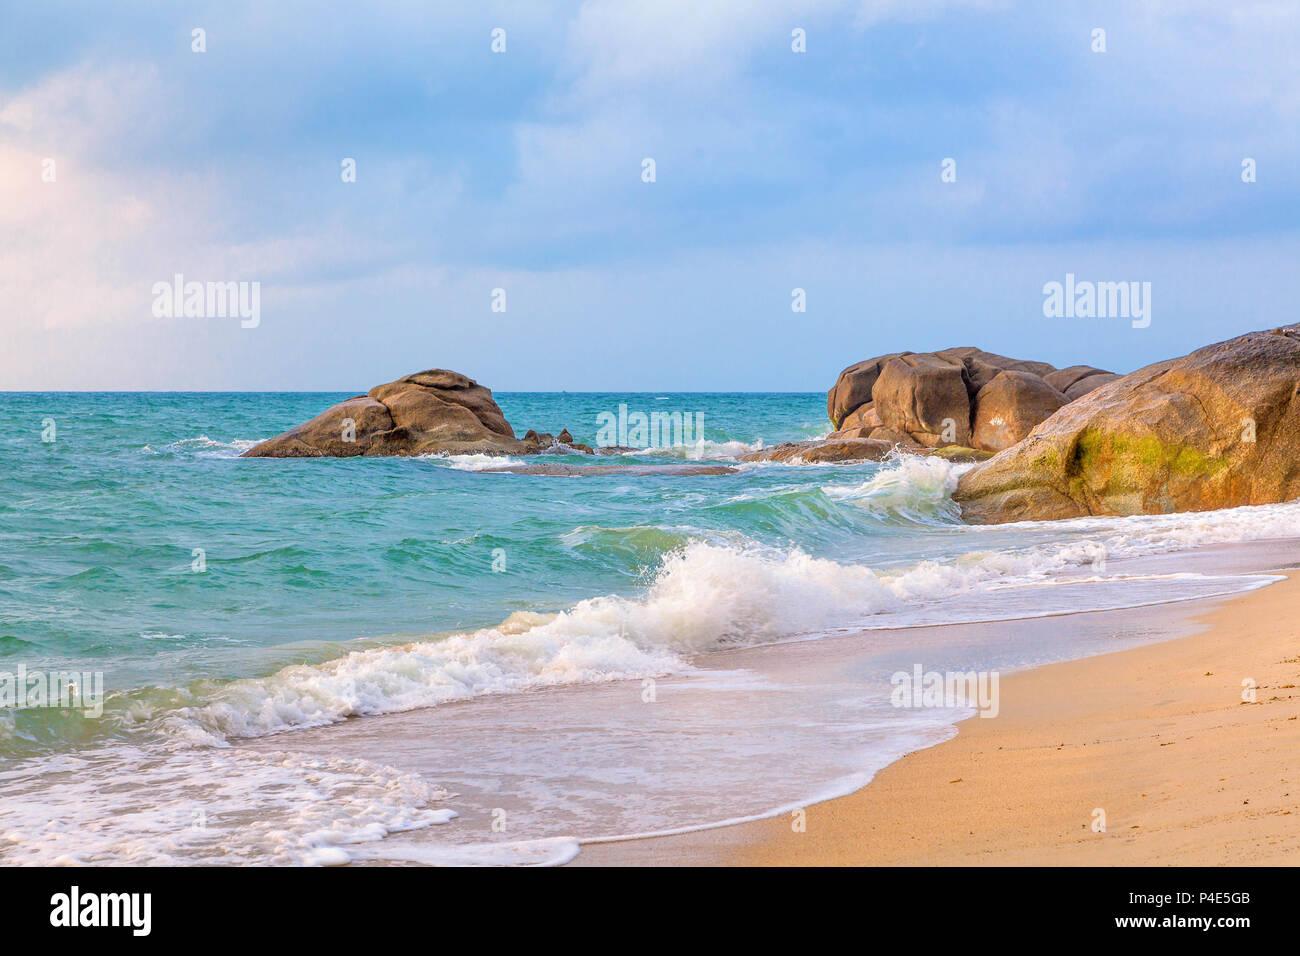 Morning on the island of Koh Samui. - Stock Image